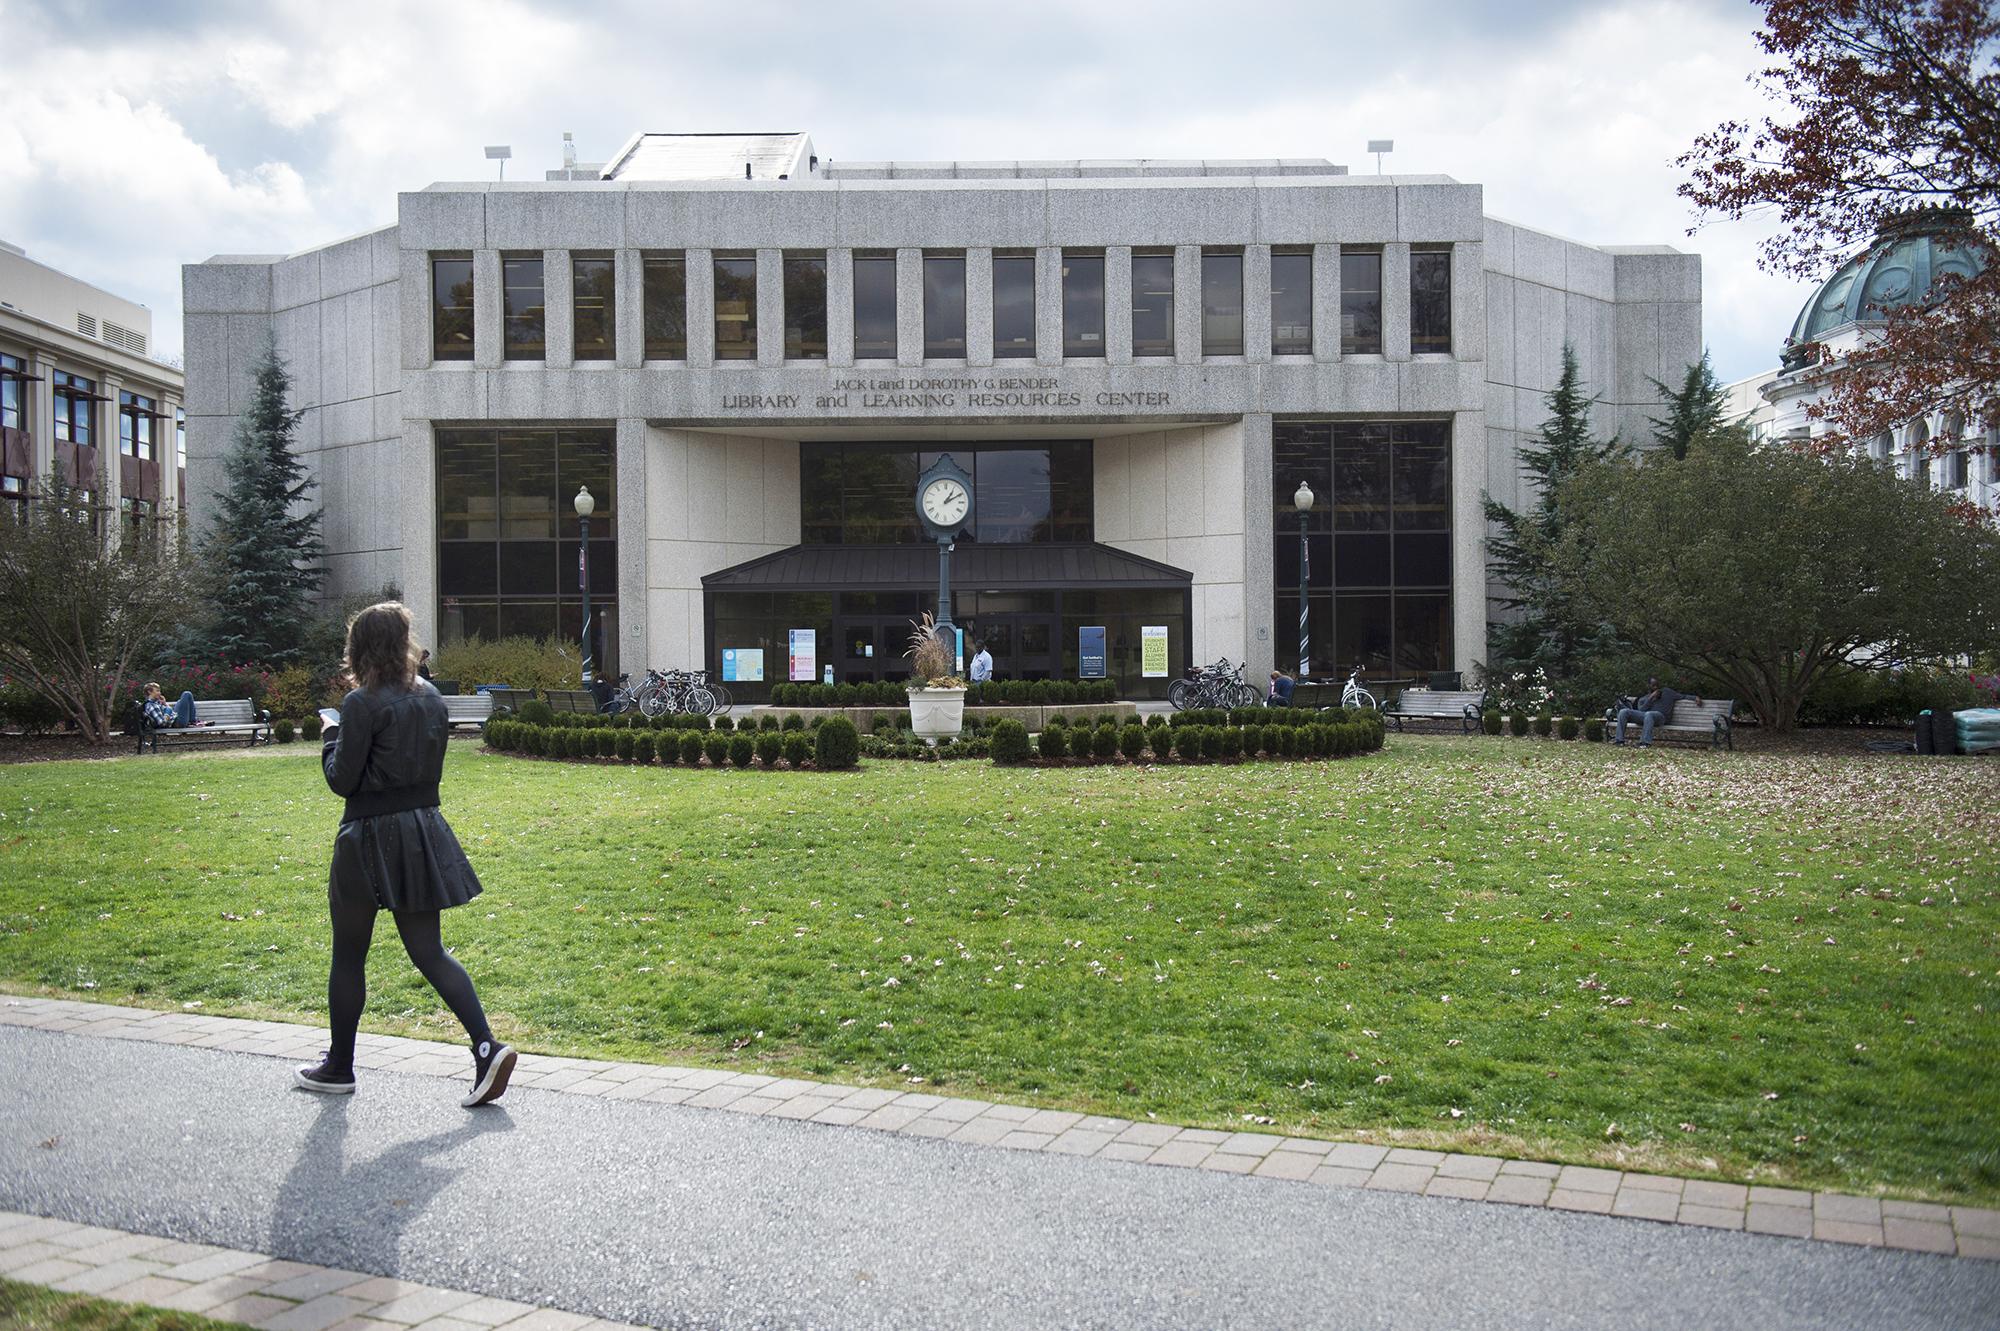 American University campus in Washington, D.C., on Nov. 9, 2016.